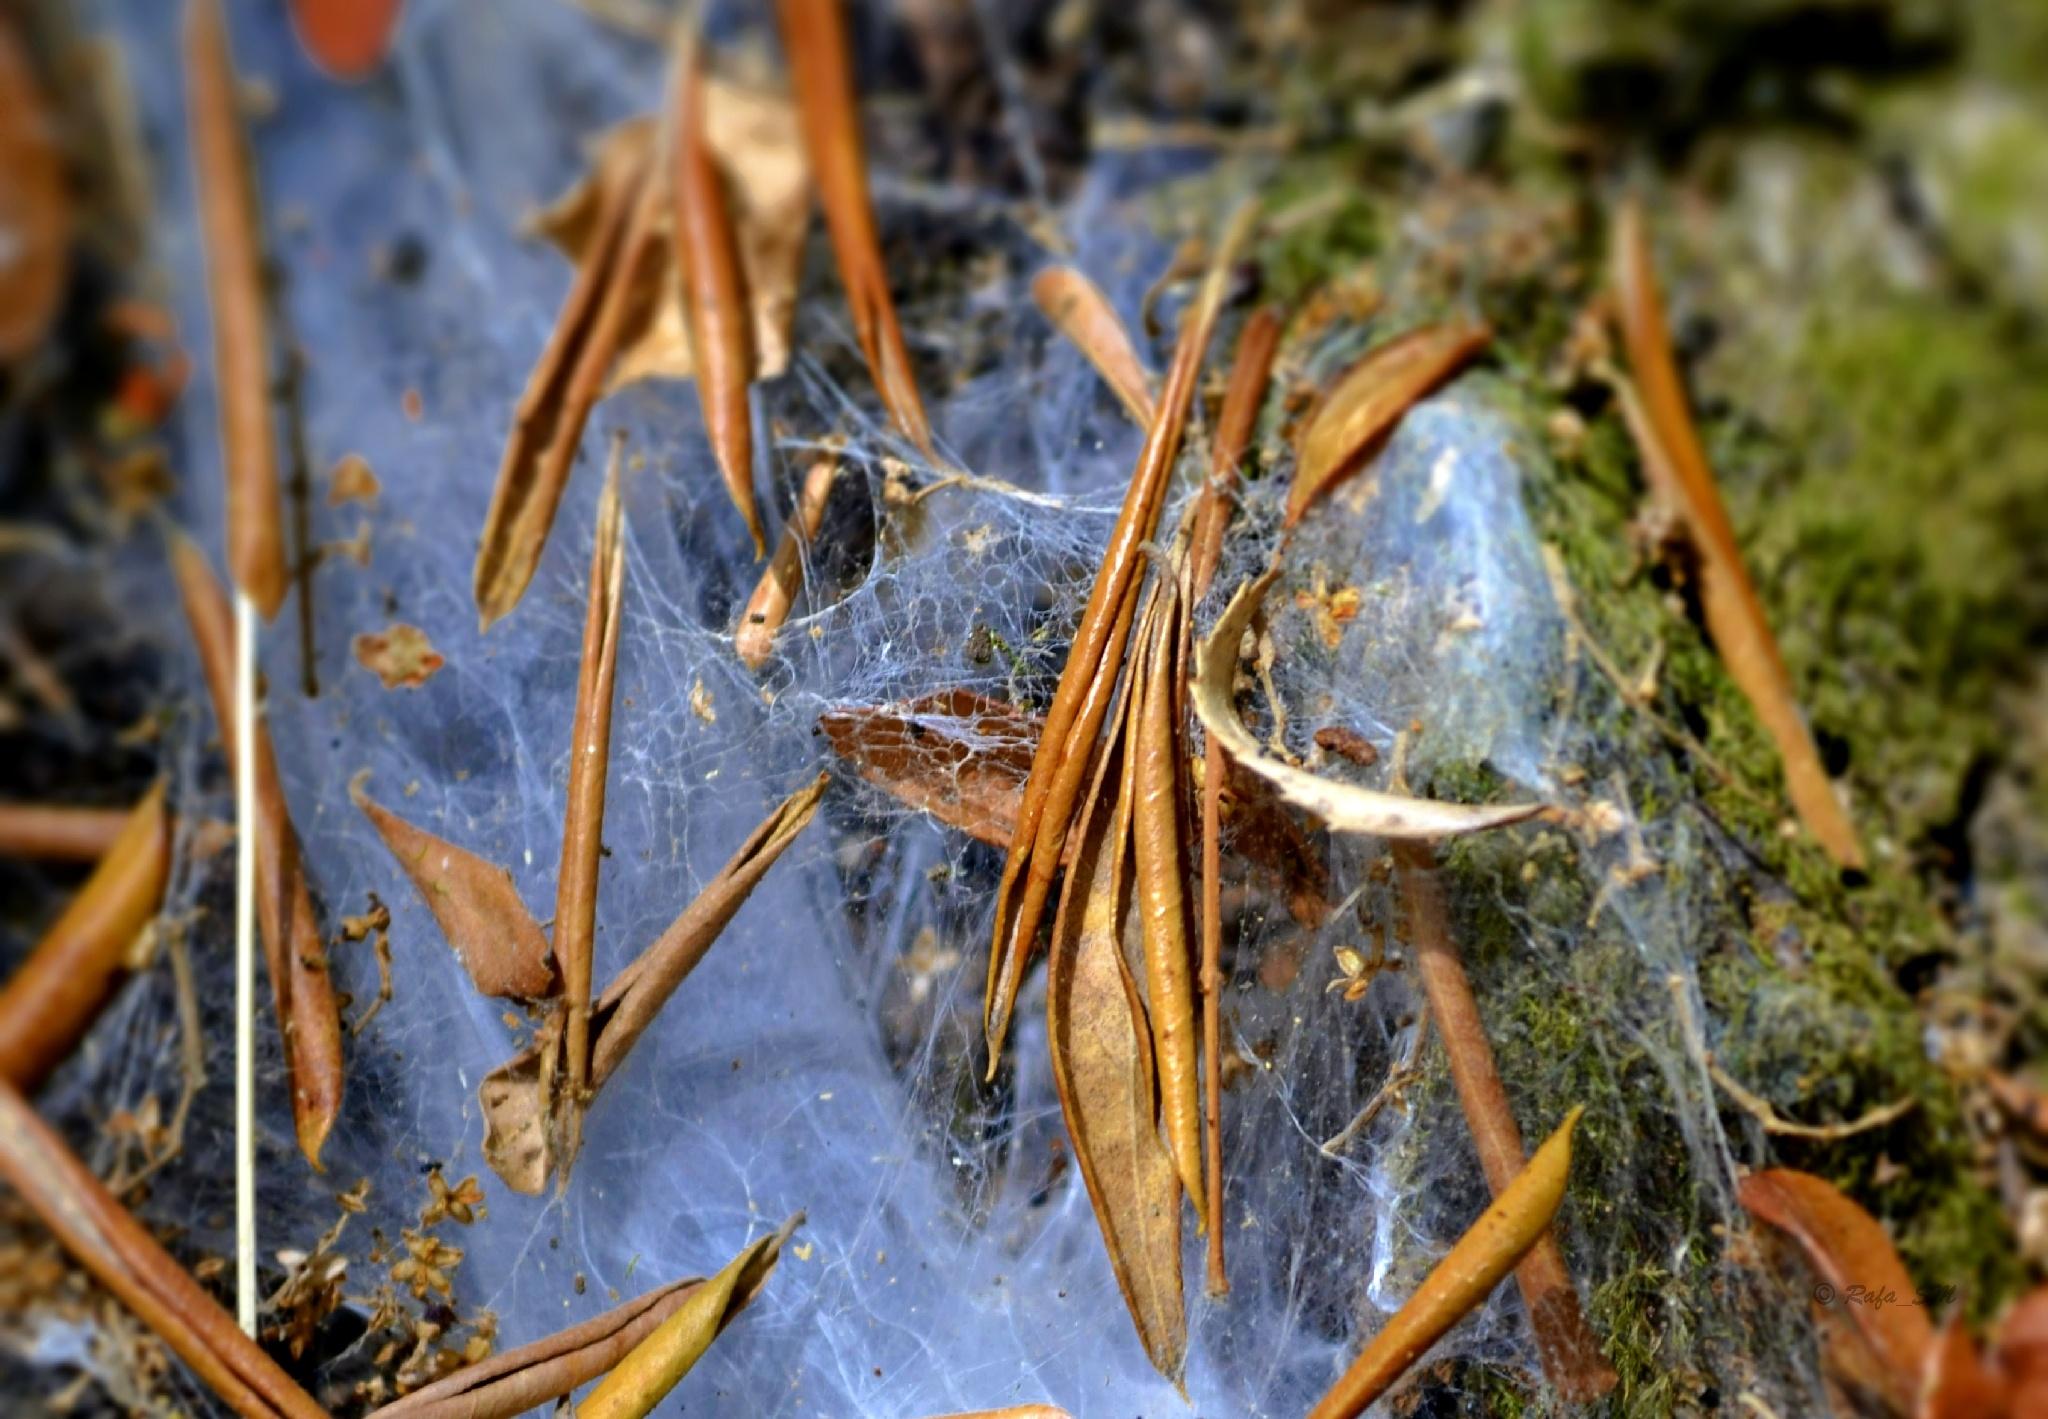 Spiderweb by RafaelSM